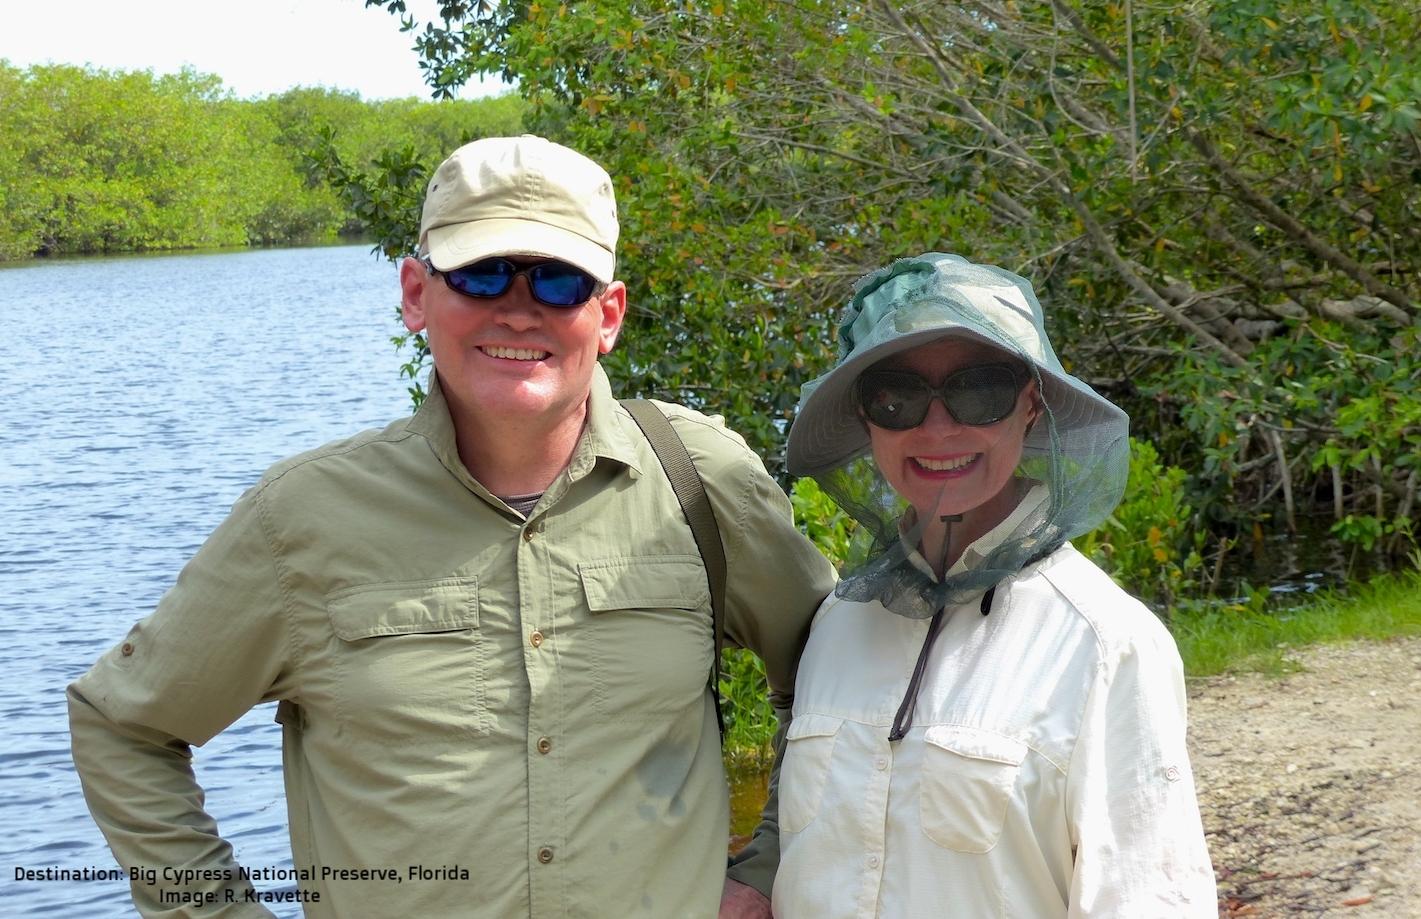 Les-Roberta-Everglades-Kayaking-Florida.JPG